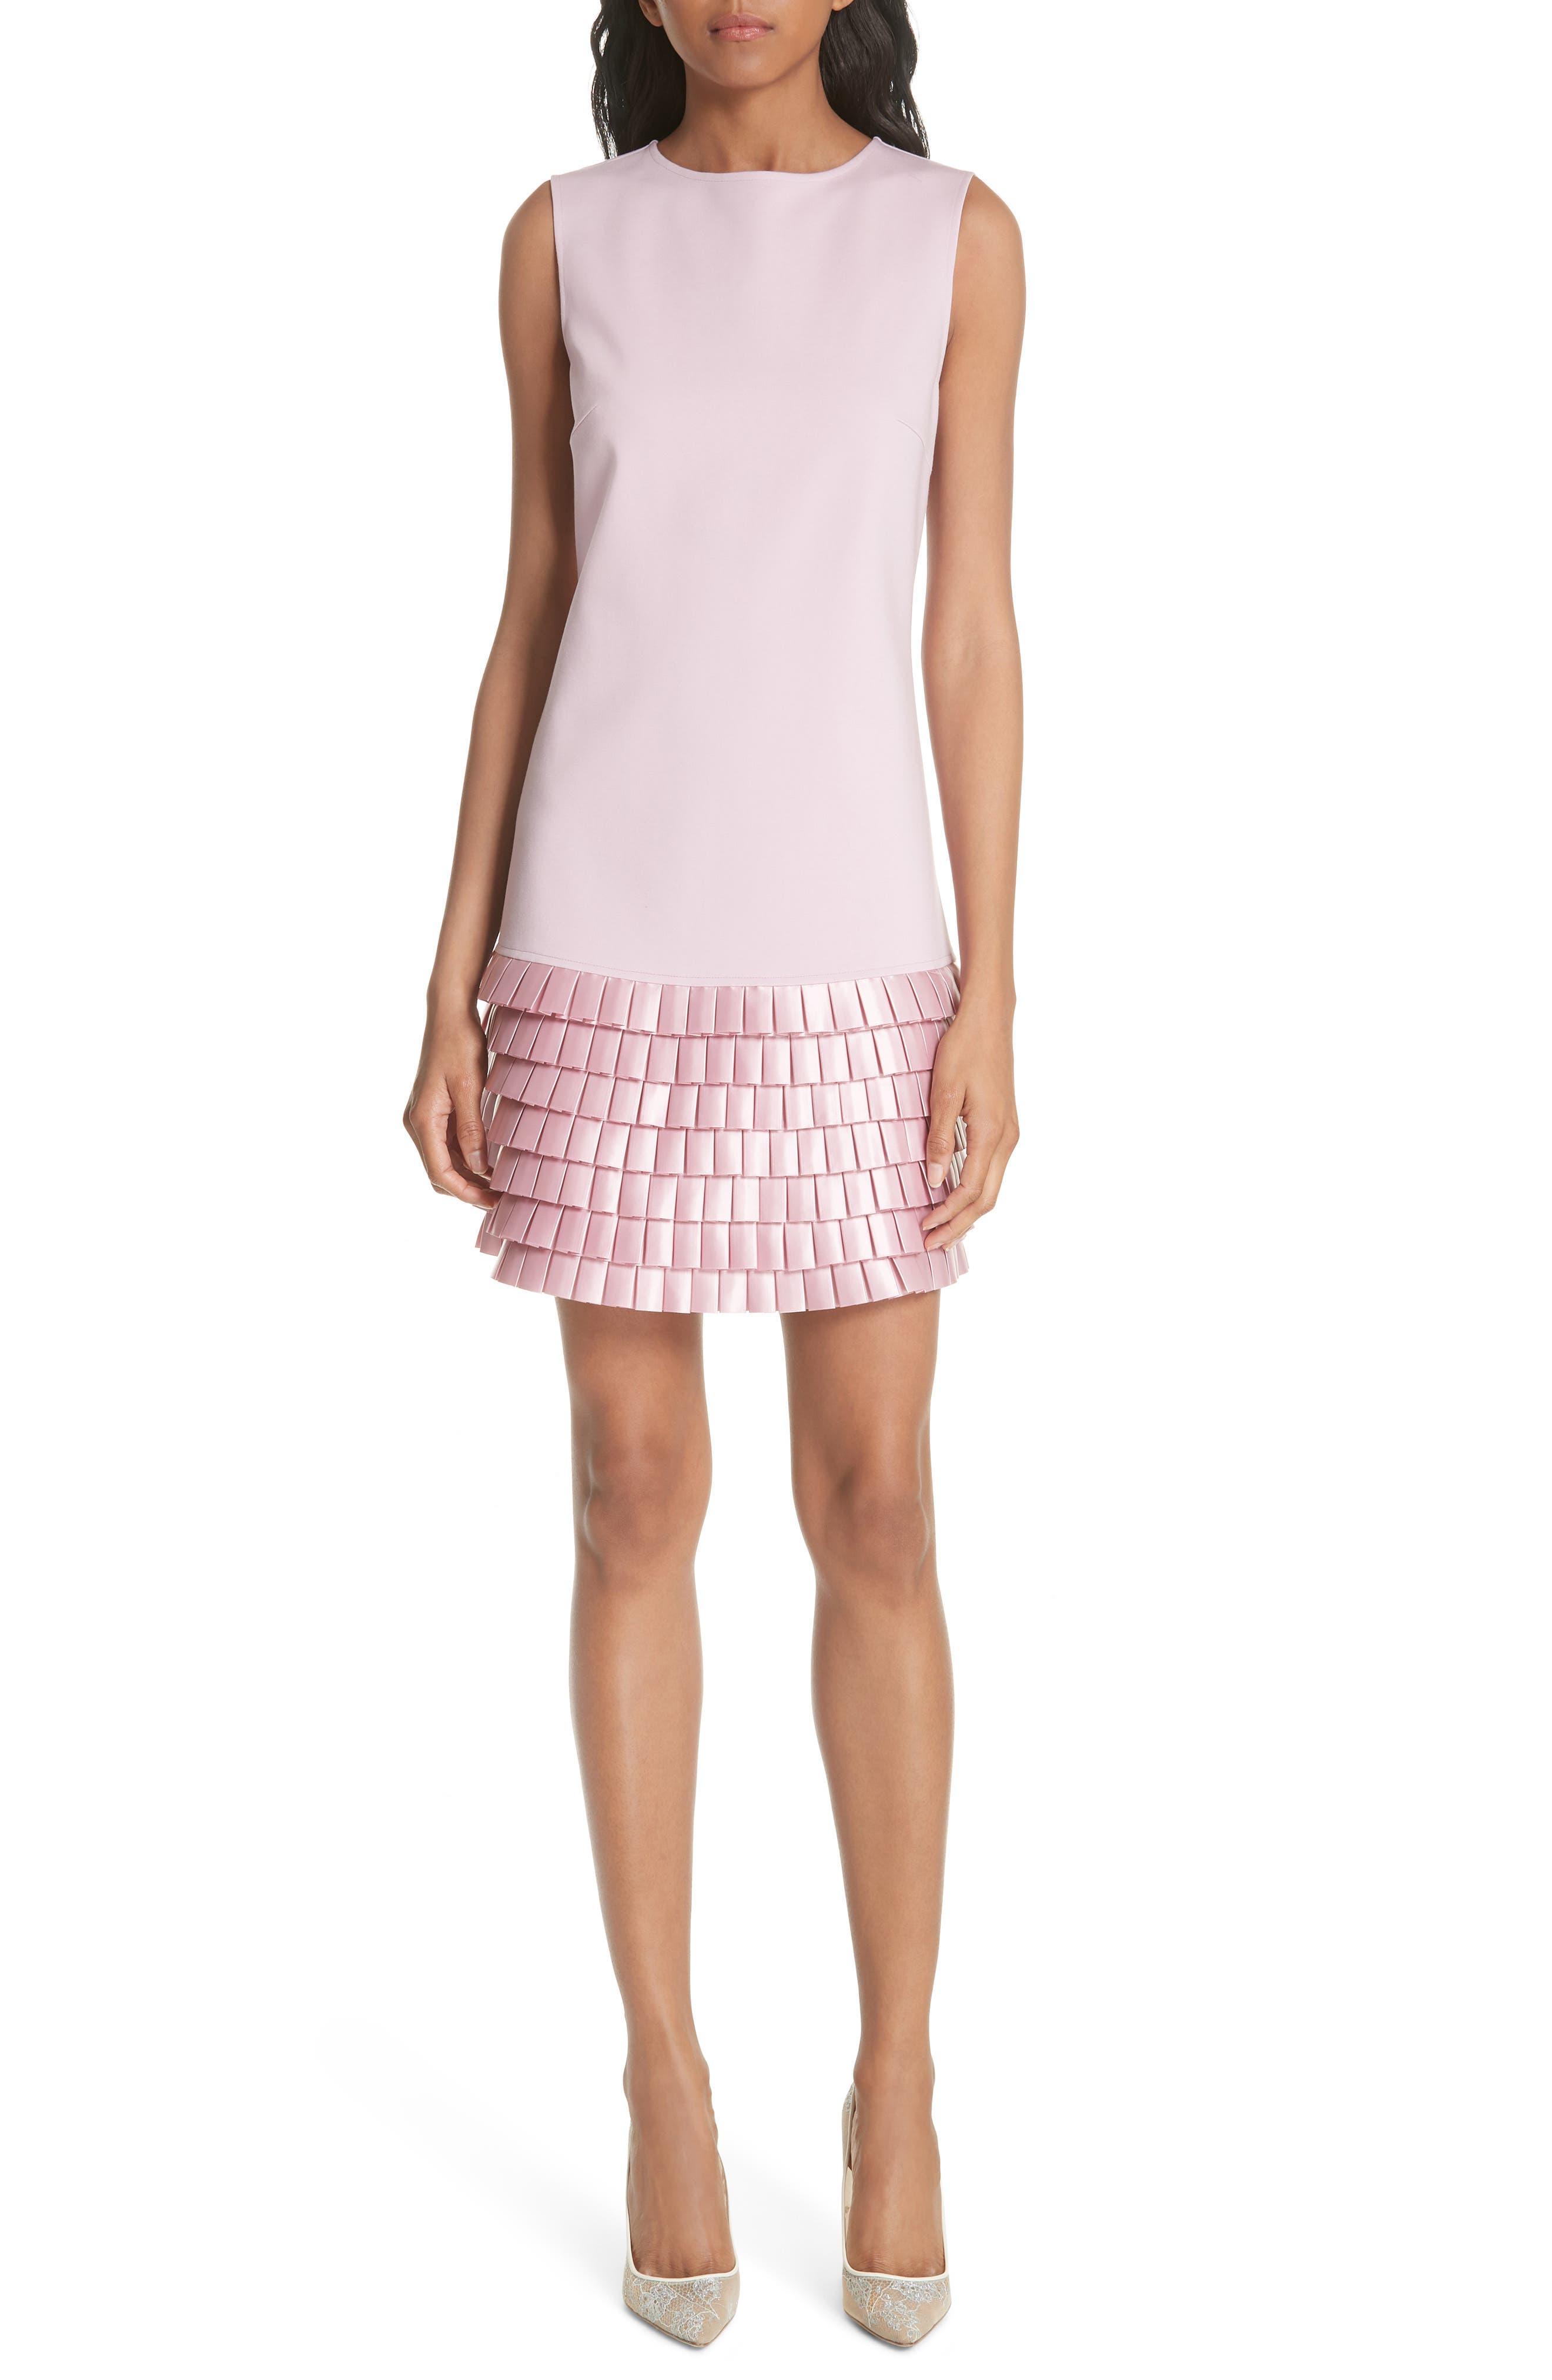 TED BAKER LONDON Satin Pleat Detail Shift Dress, Main, color, 680